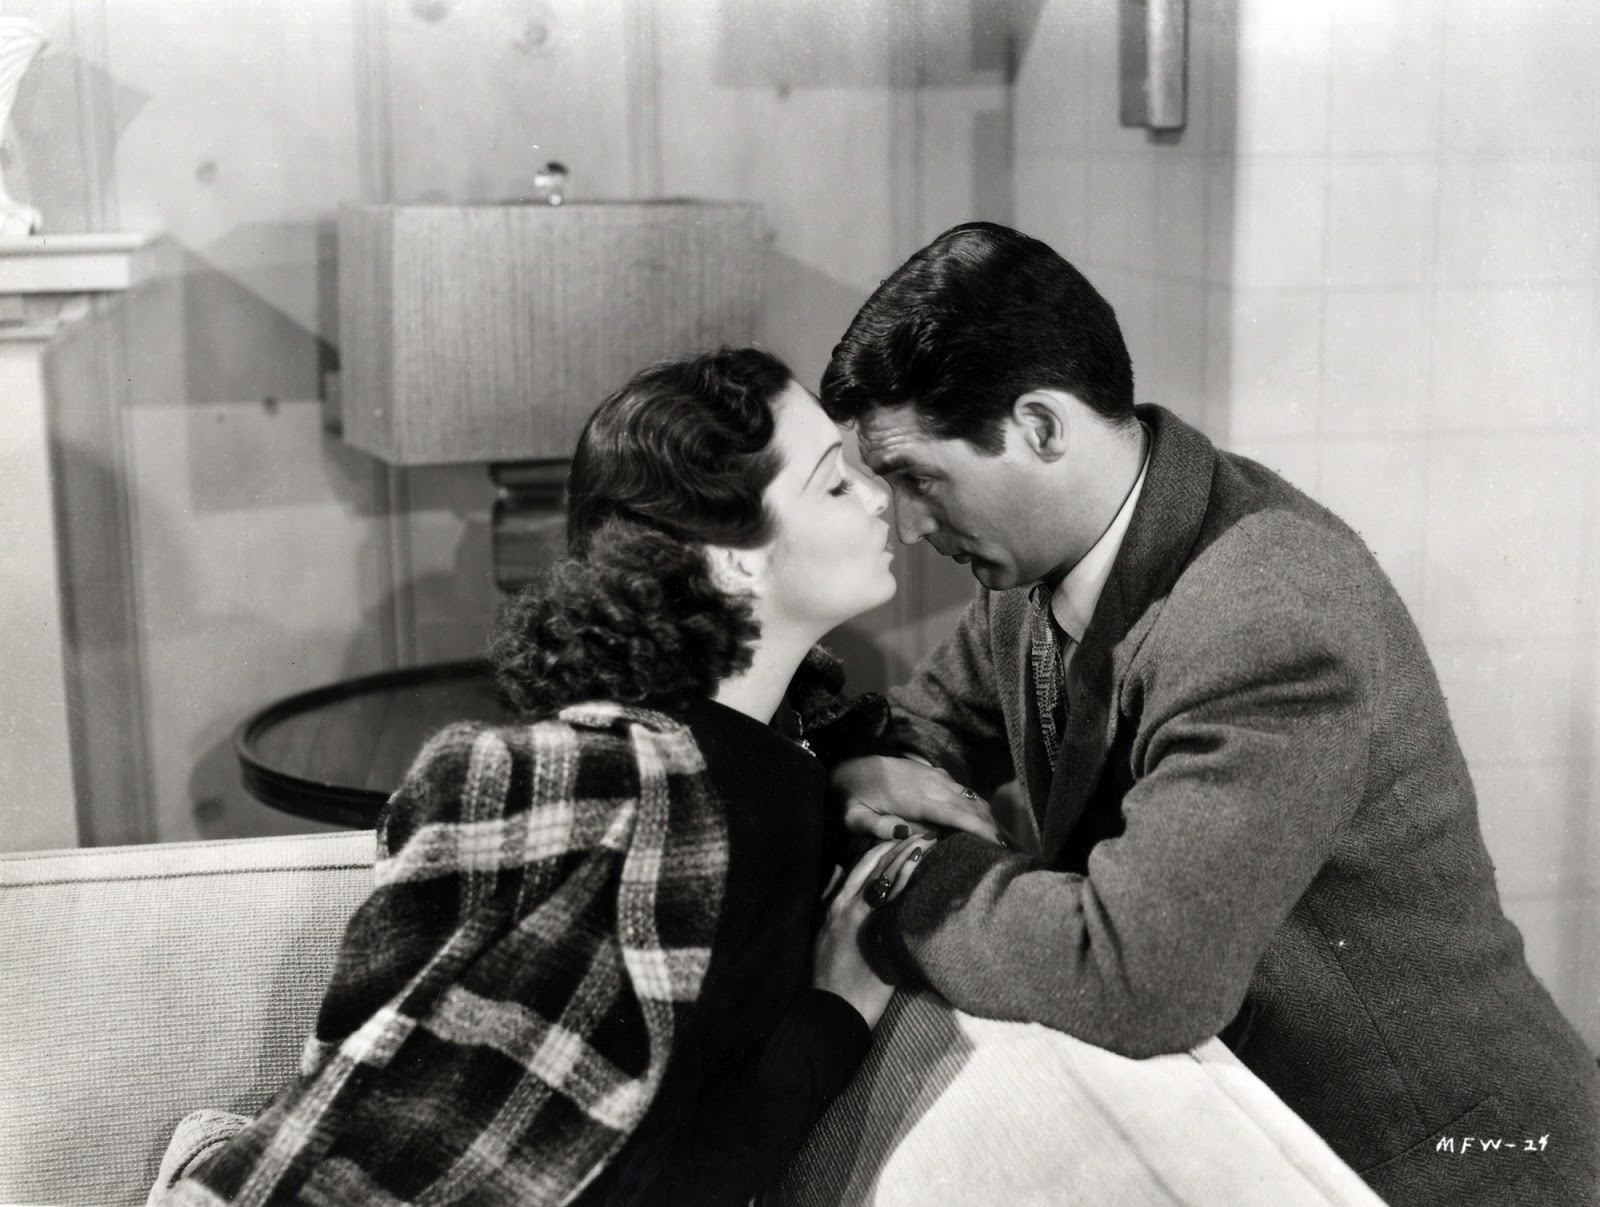 76ac97da Misfortunes of Imaginary Beings: My Favorite Wife (Garson Kanin, 1940)